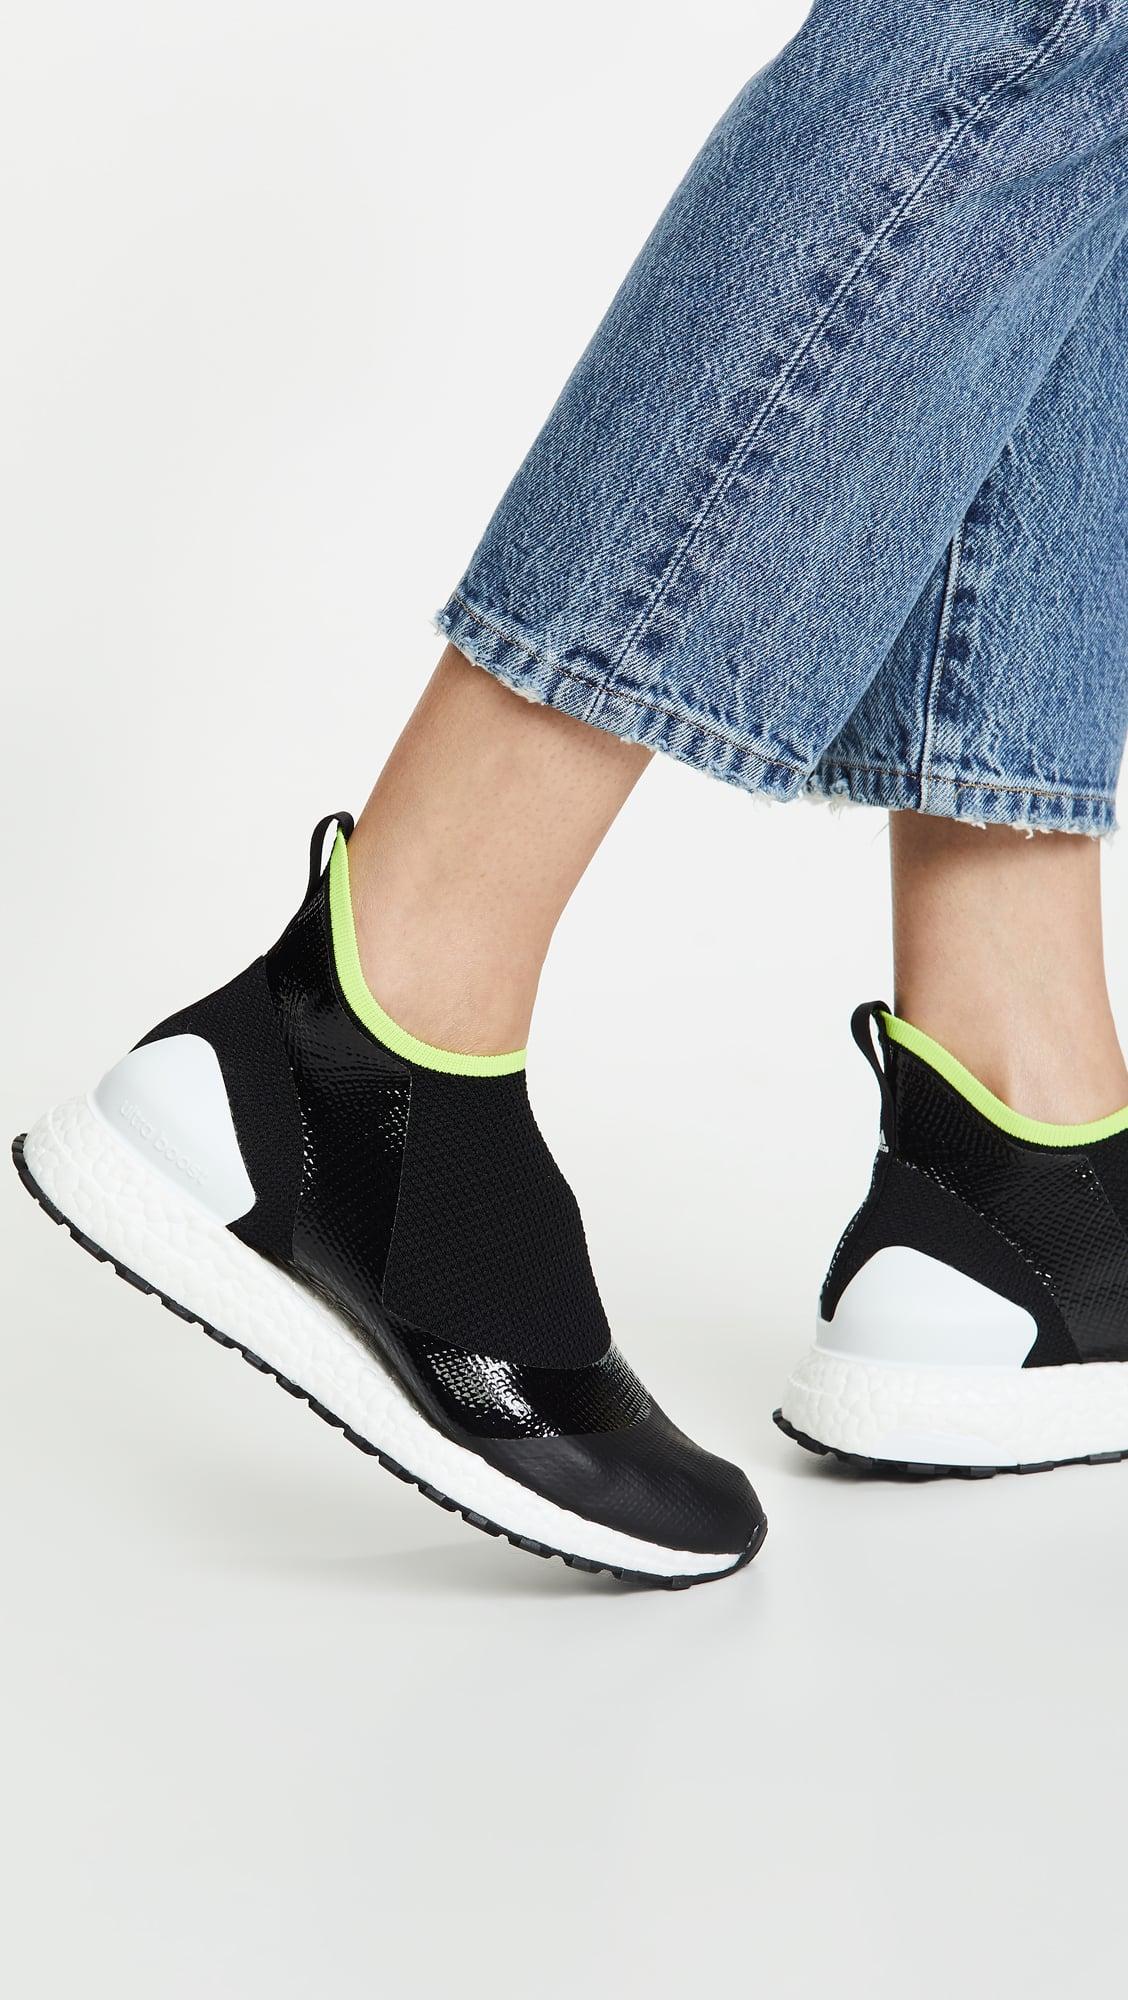 adidas shoes ultra boost stella mccartney